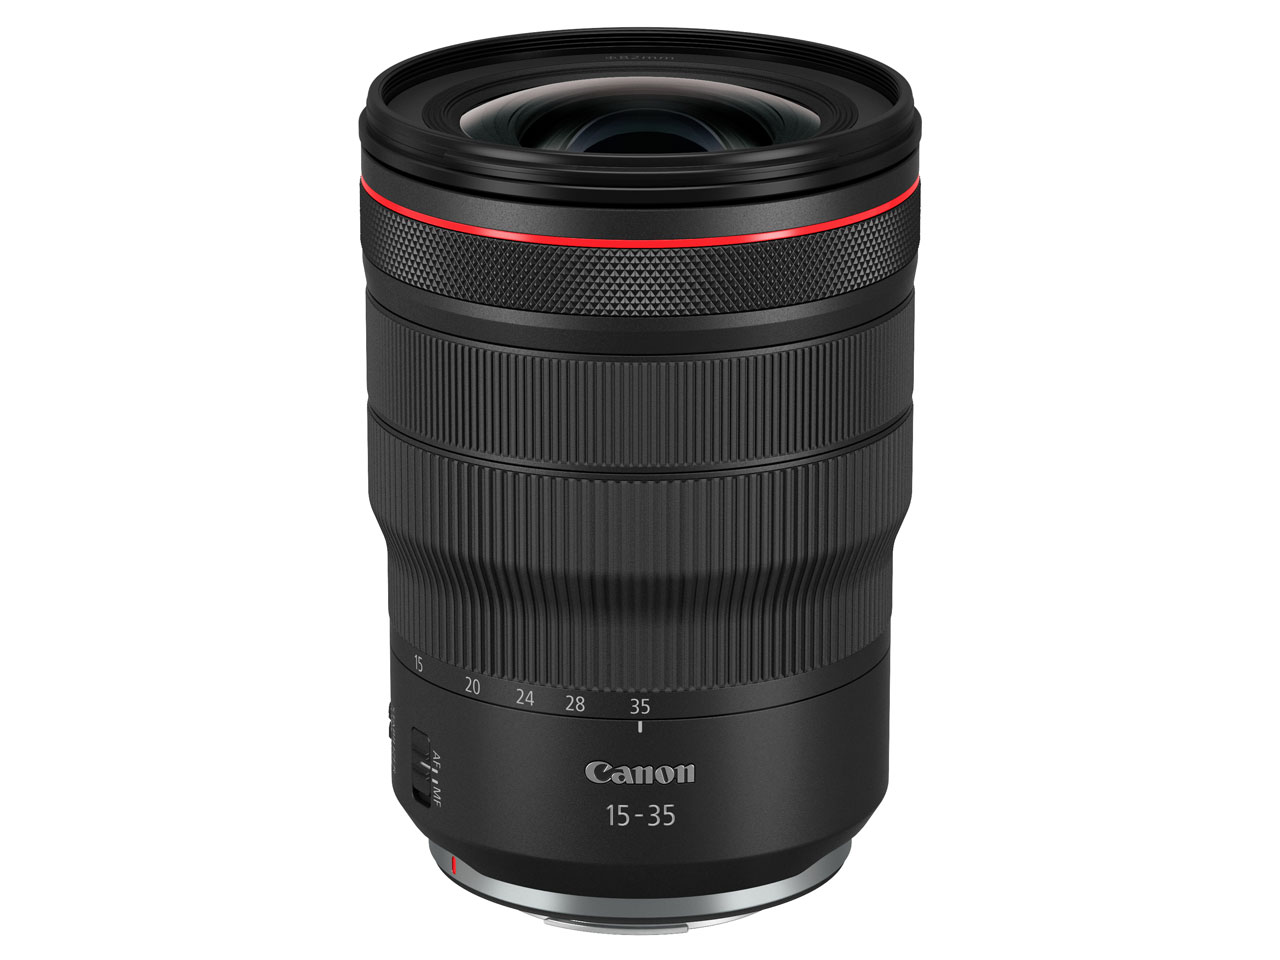 Canon キヤノン RF15-35mm F2.8 L IS USM [15-35mm/F2.8 キヤノンRFマウント]